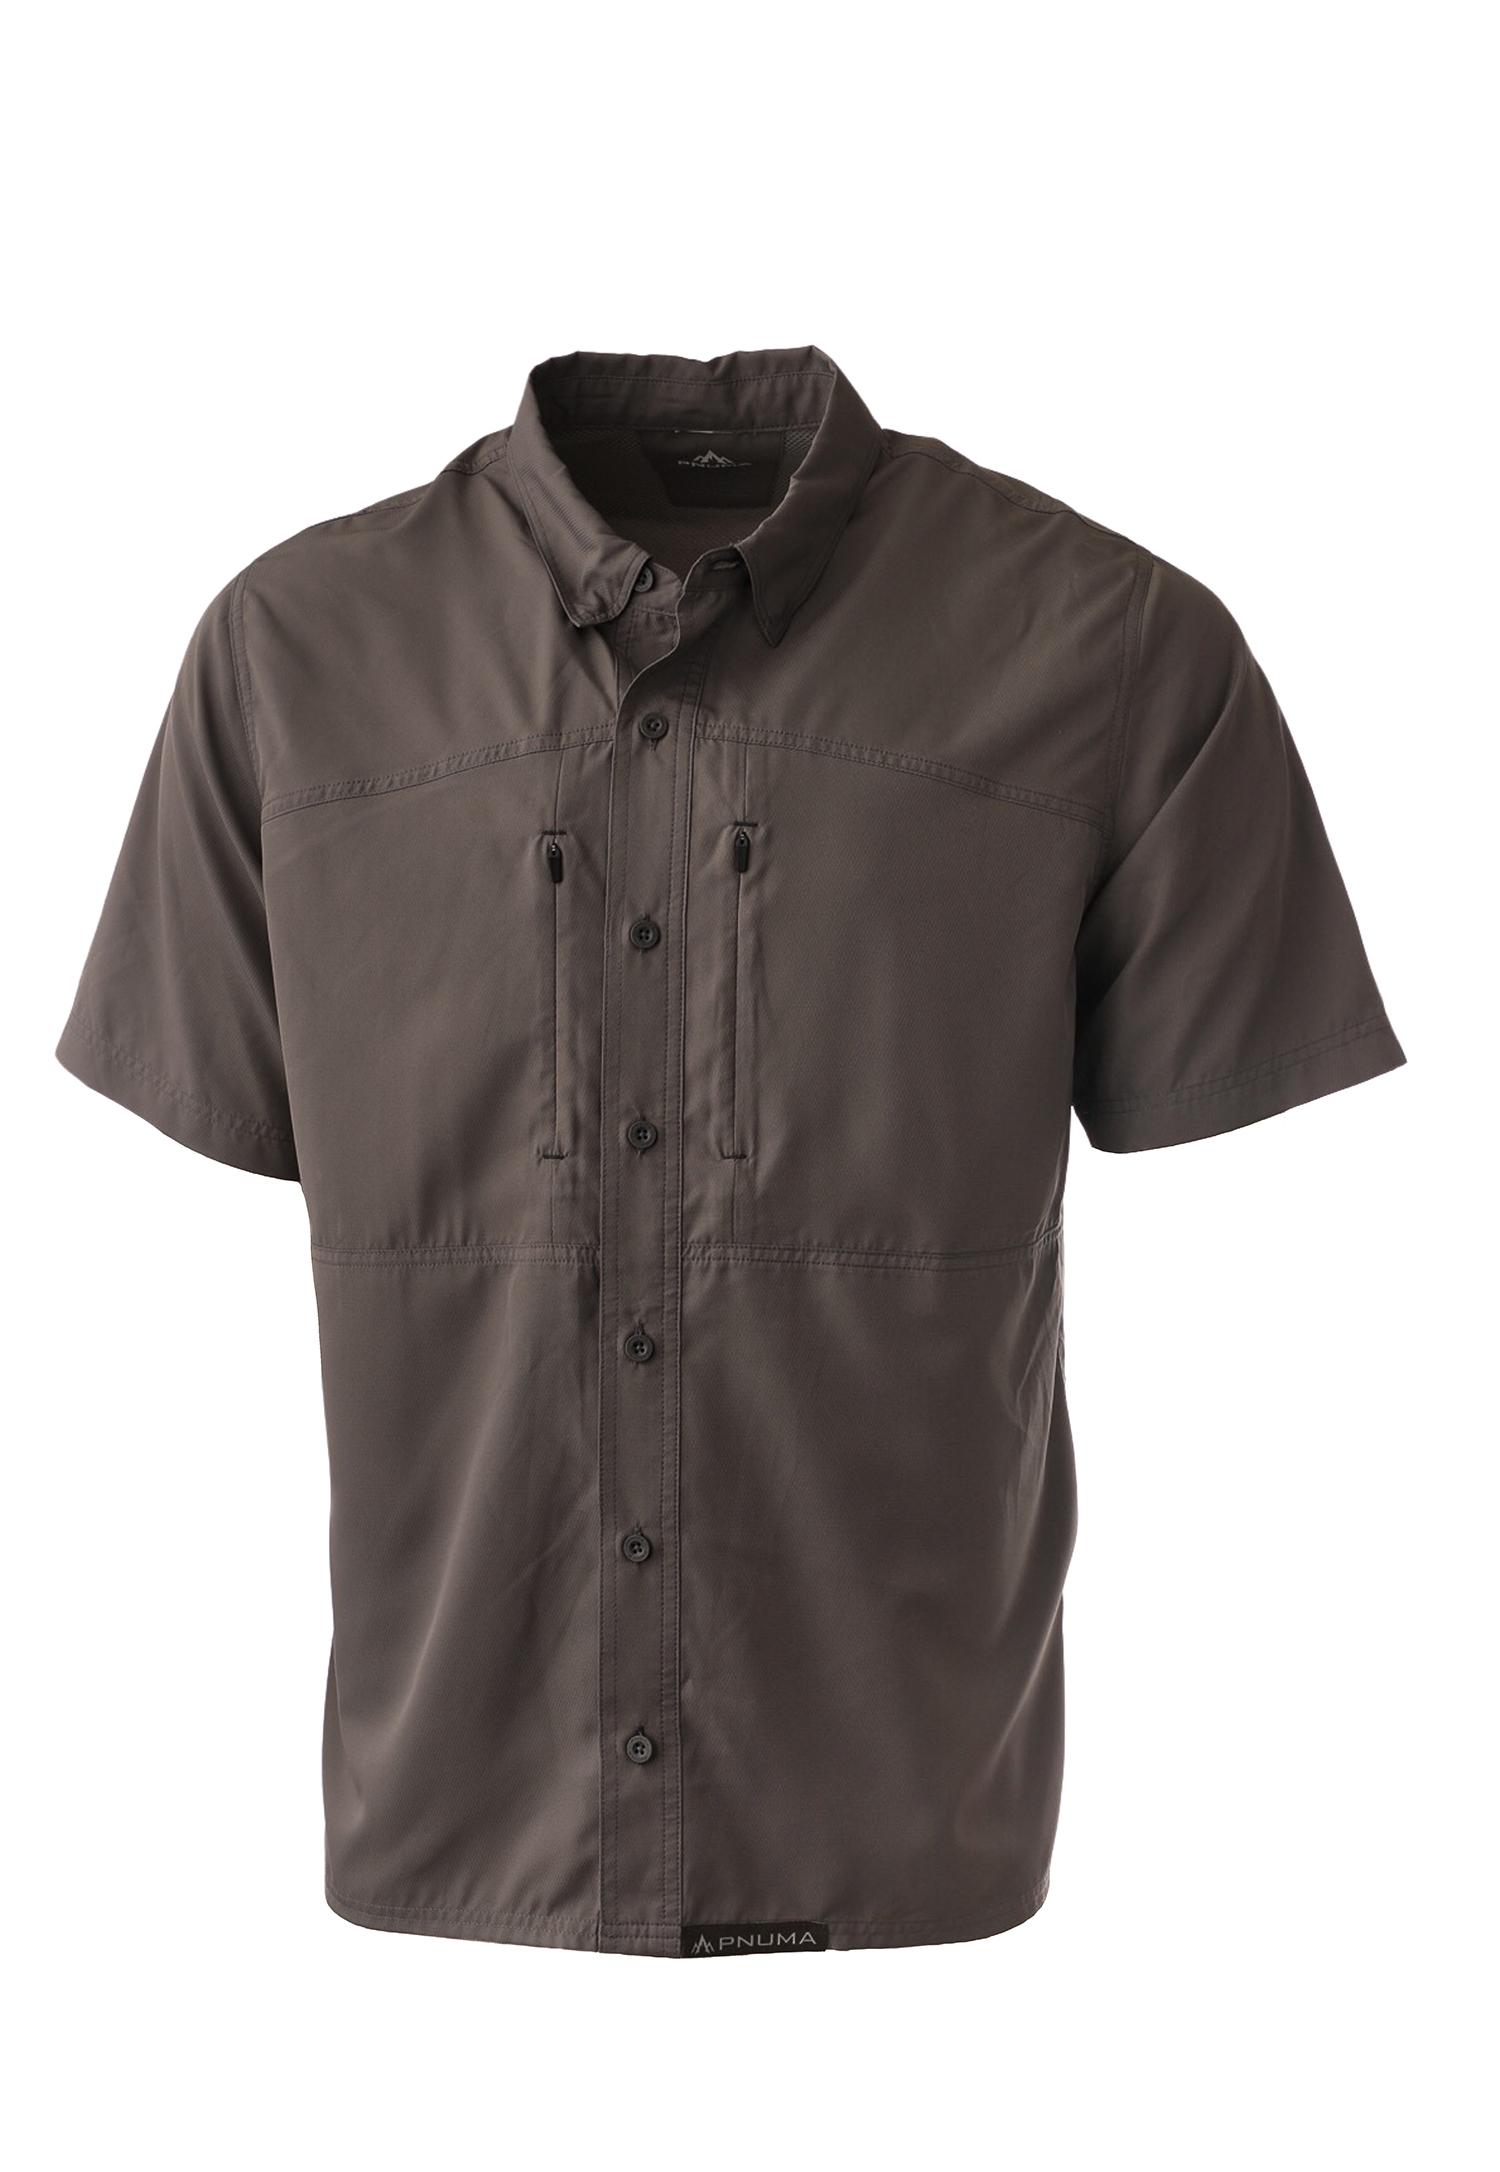 Shooting Shirt - Short Sleeve